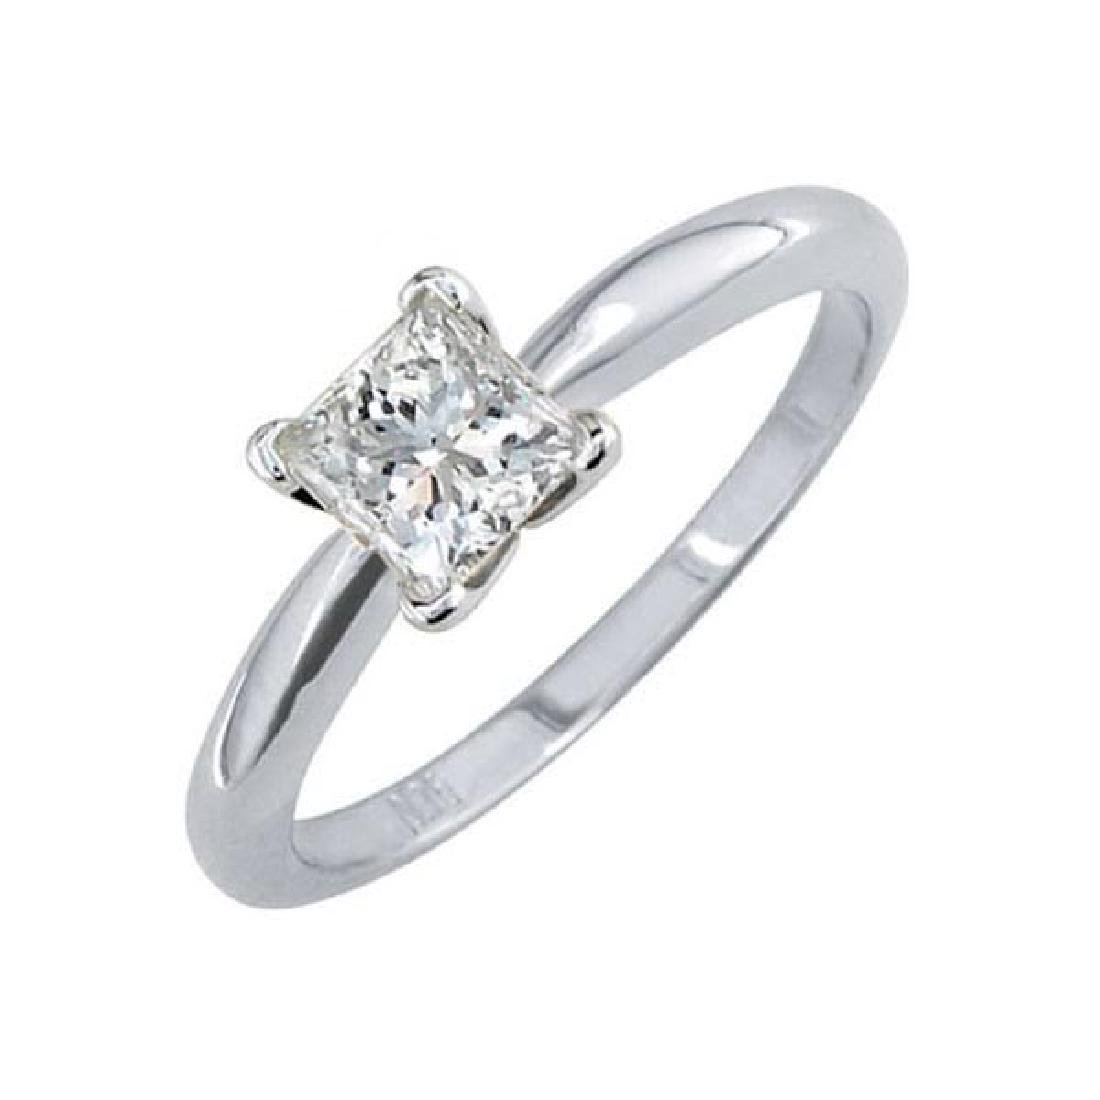 Certified 0.31 CTW Princess Diamond Solitaire 14k Ring